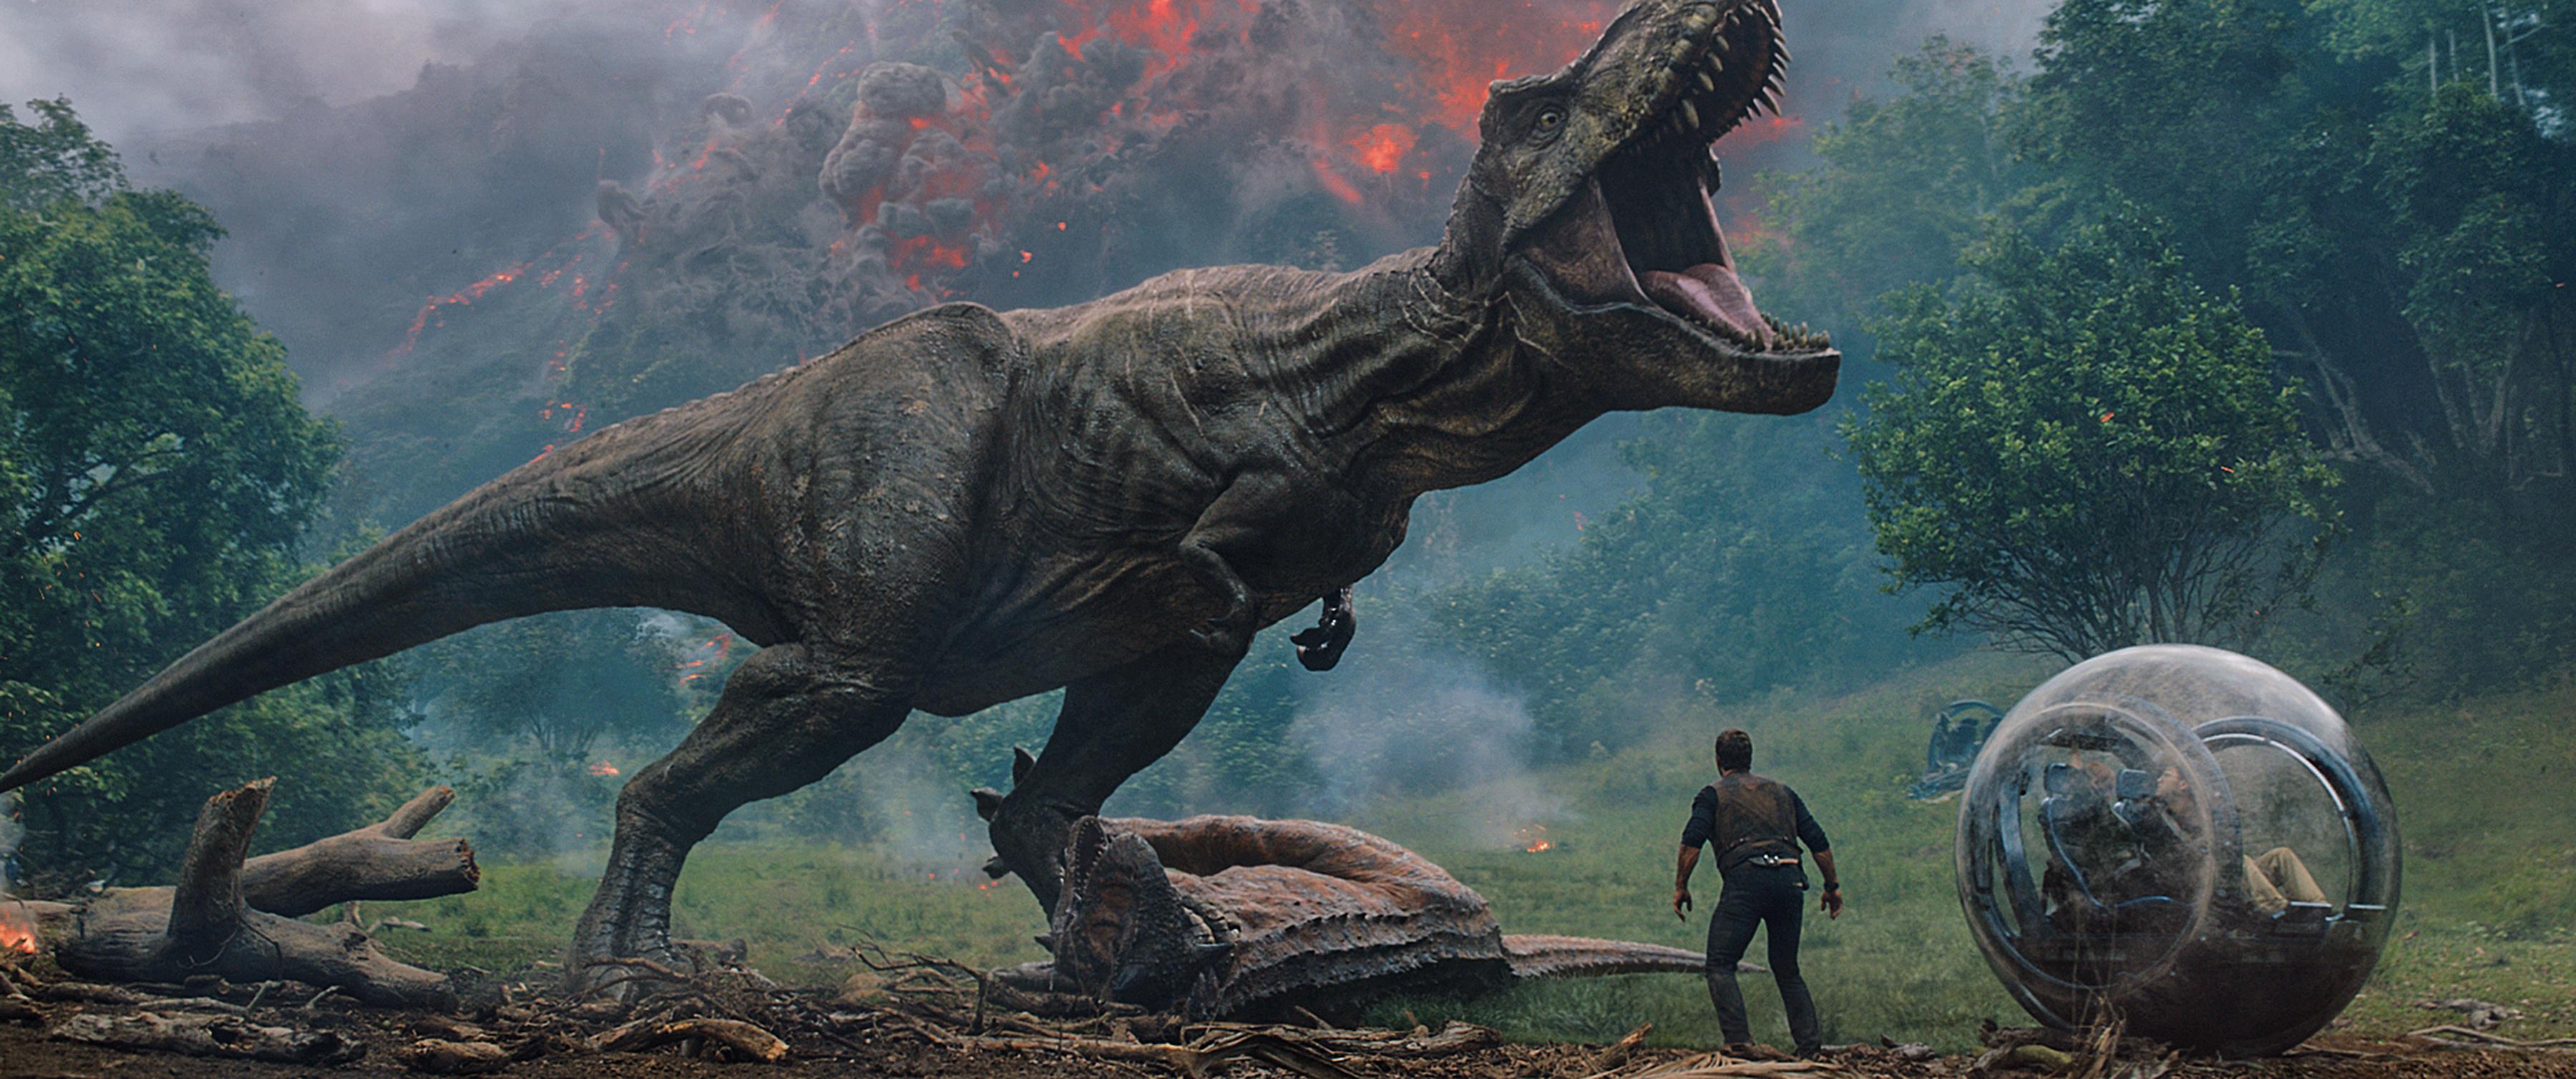 Jurassic World: The Fallen Kingdom